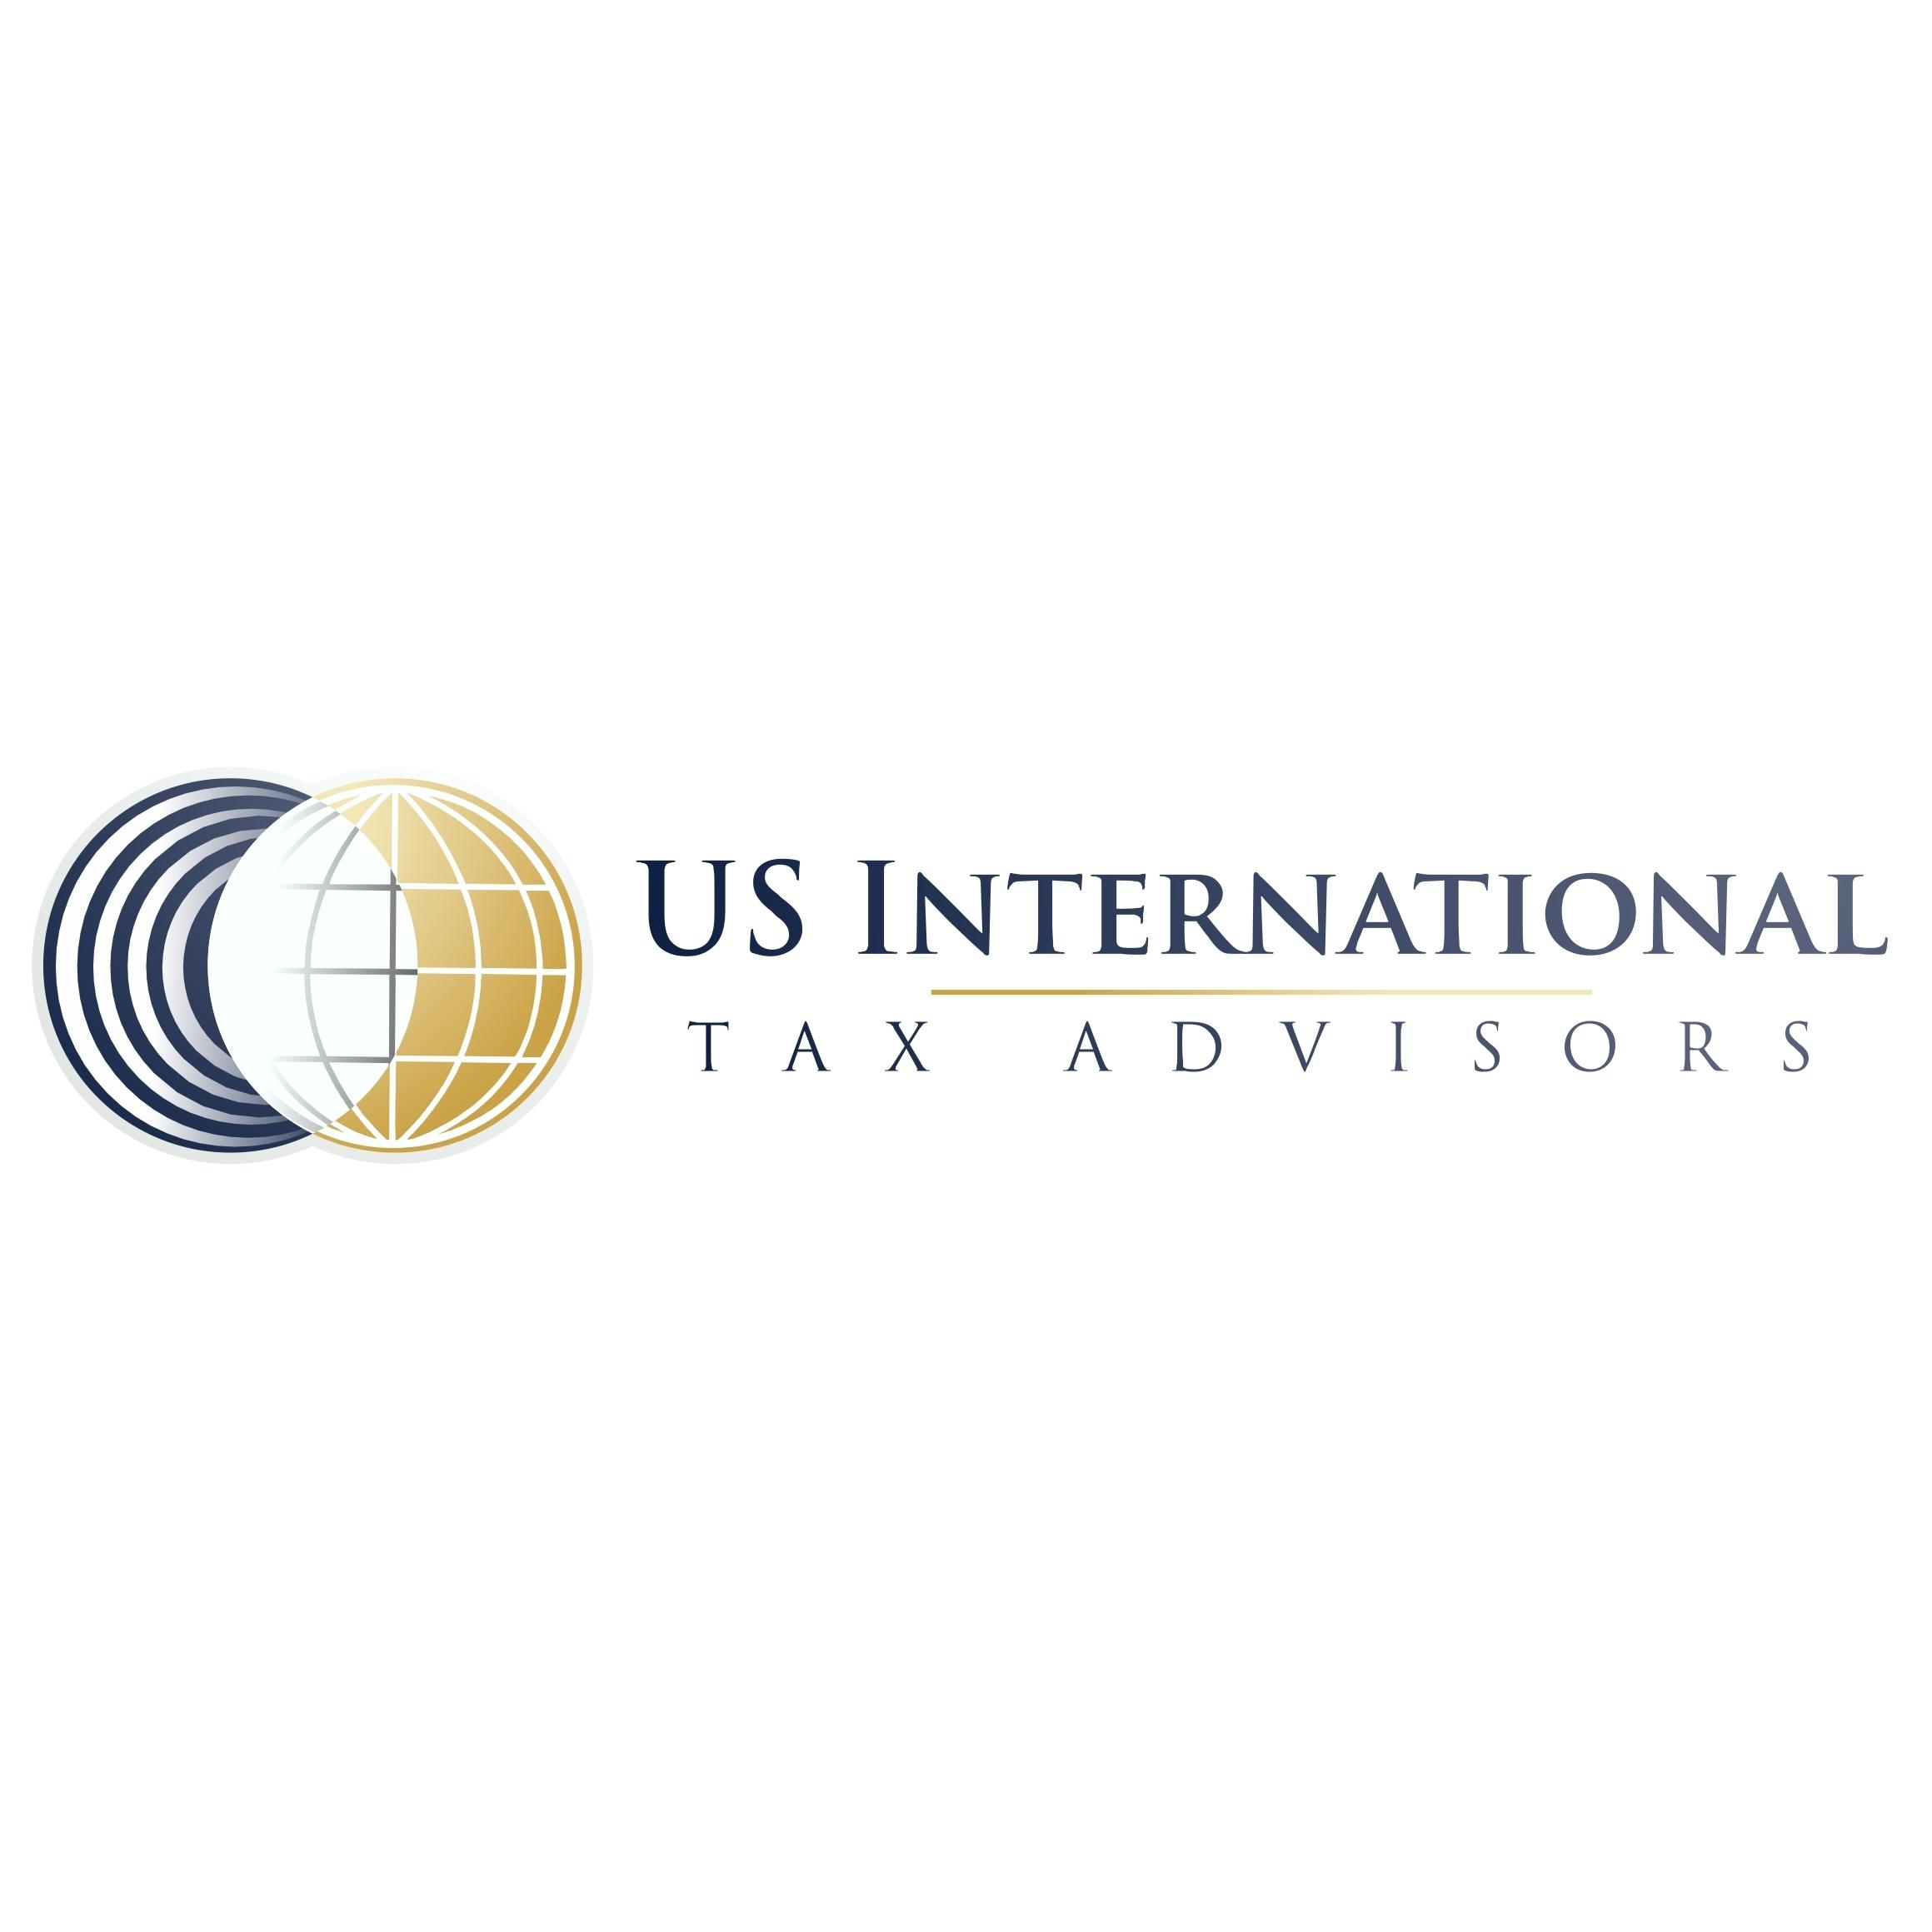 US International Tax Advisors